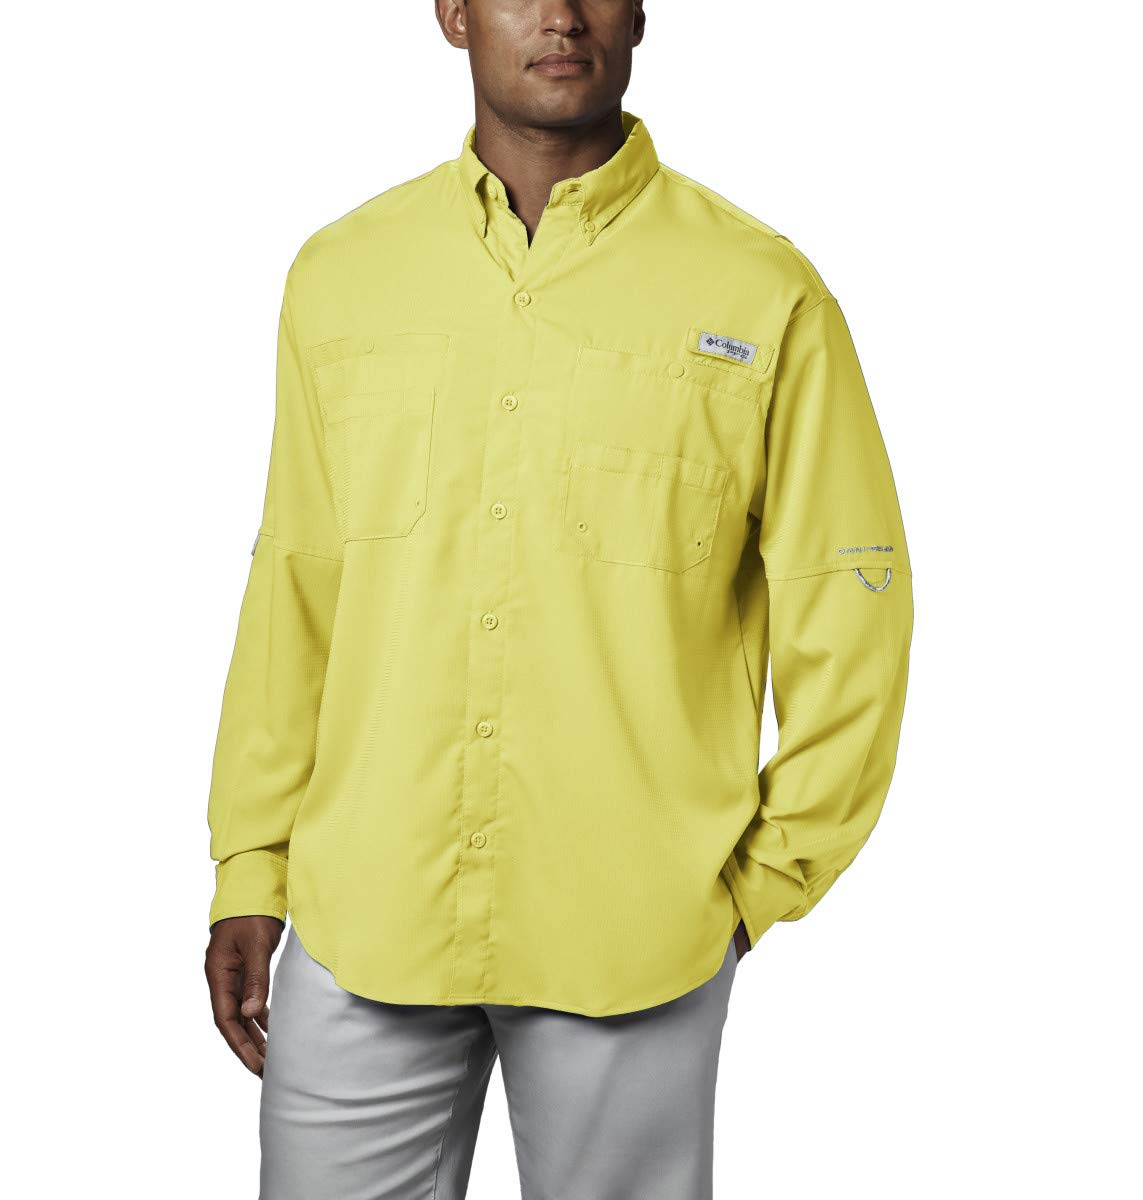 Columbia Men's PFG Tamiami II Long Sleeve Shirt - Big , Sunlit, X-Small